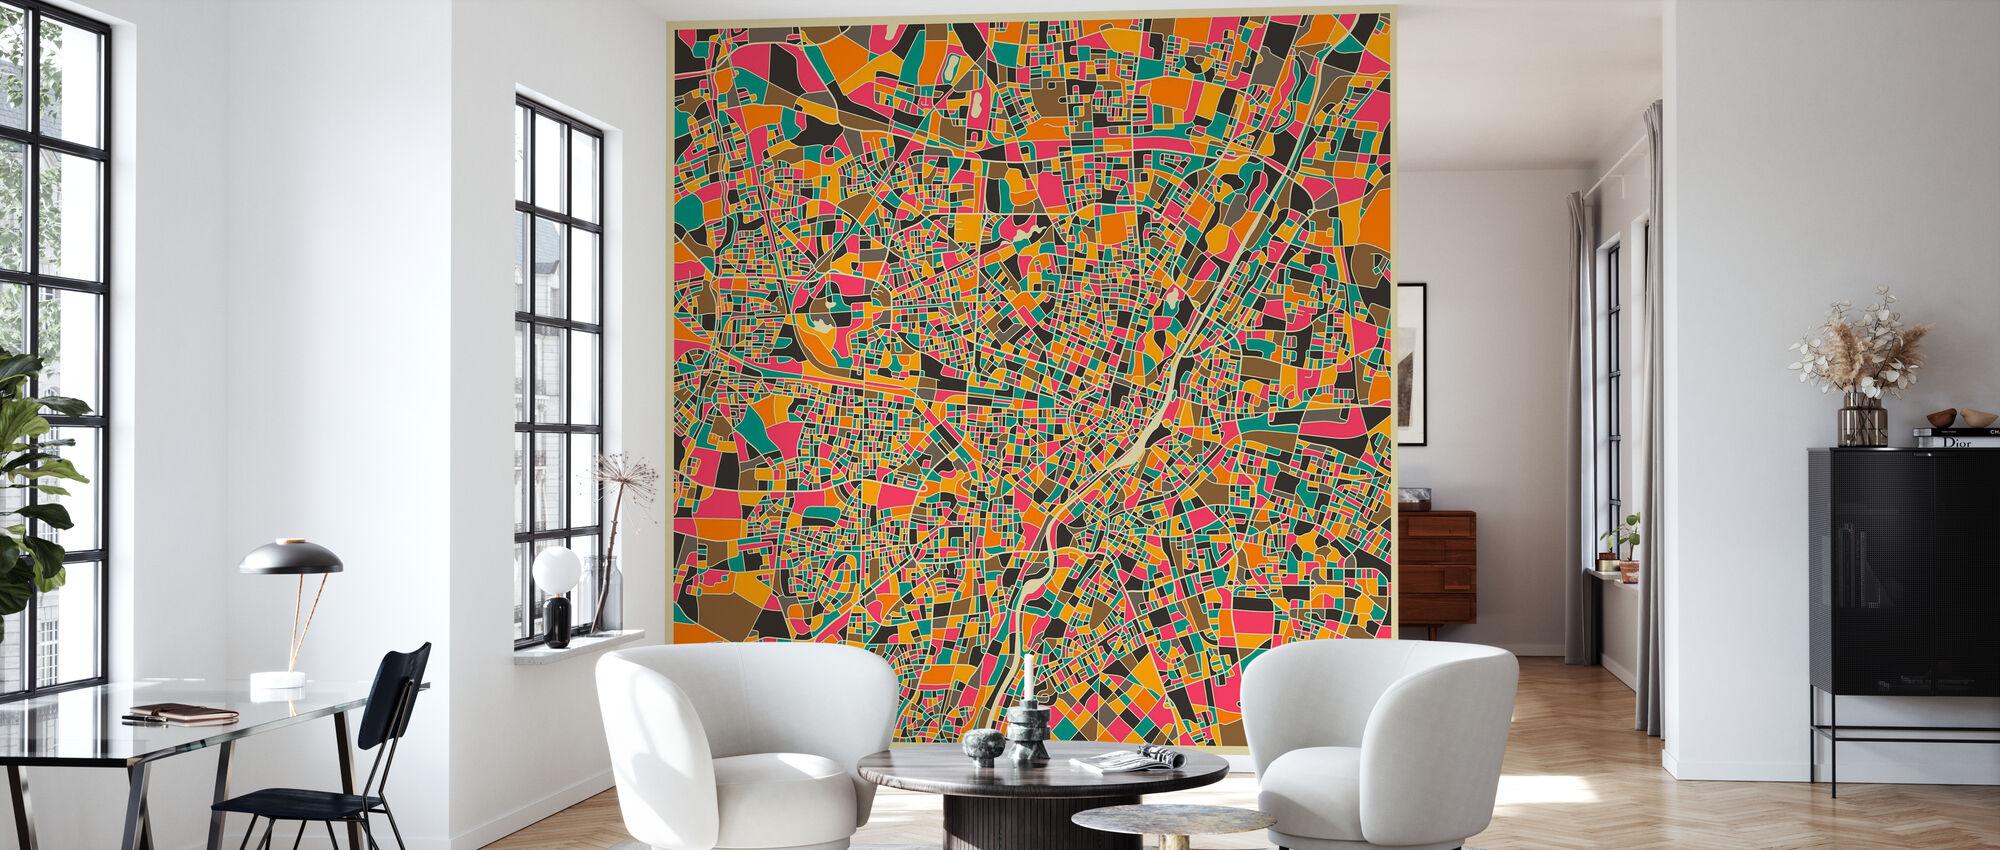 Multicolor Map - Munich - Wallpaper - Living Room